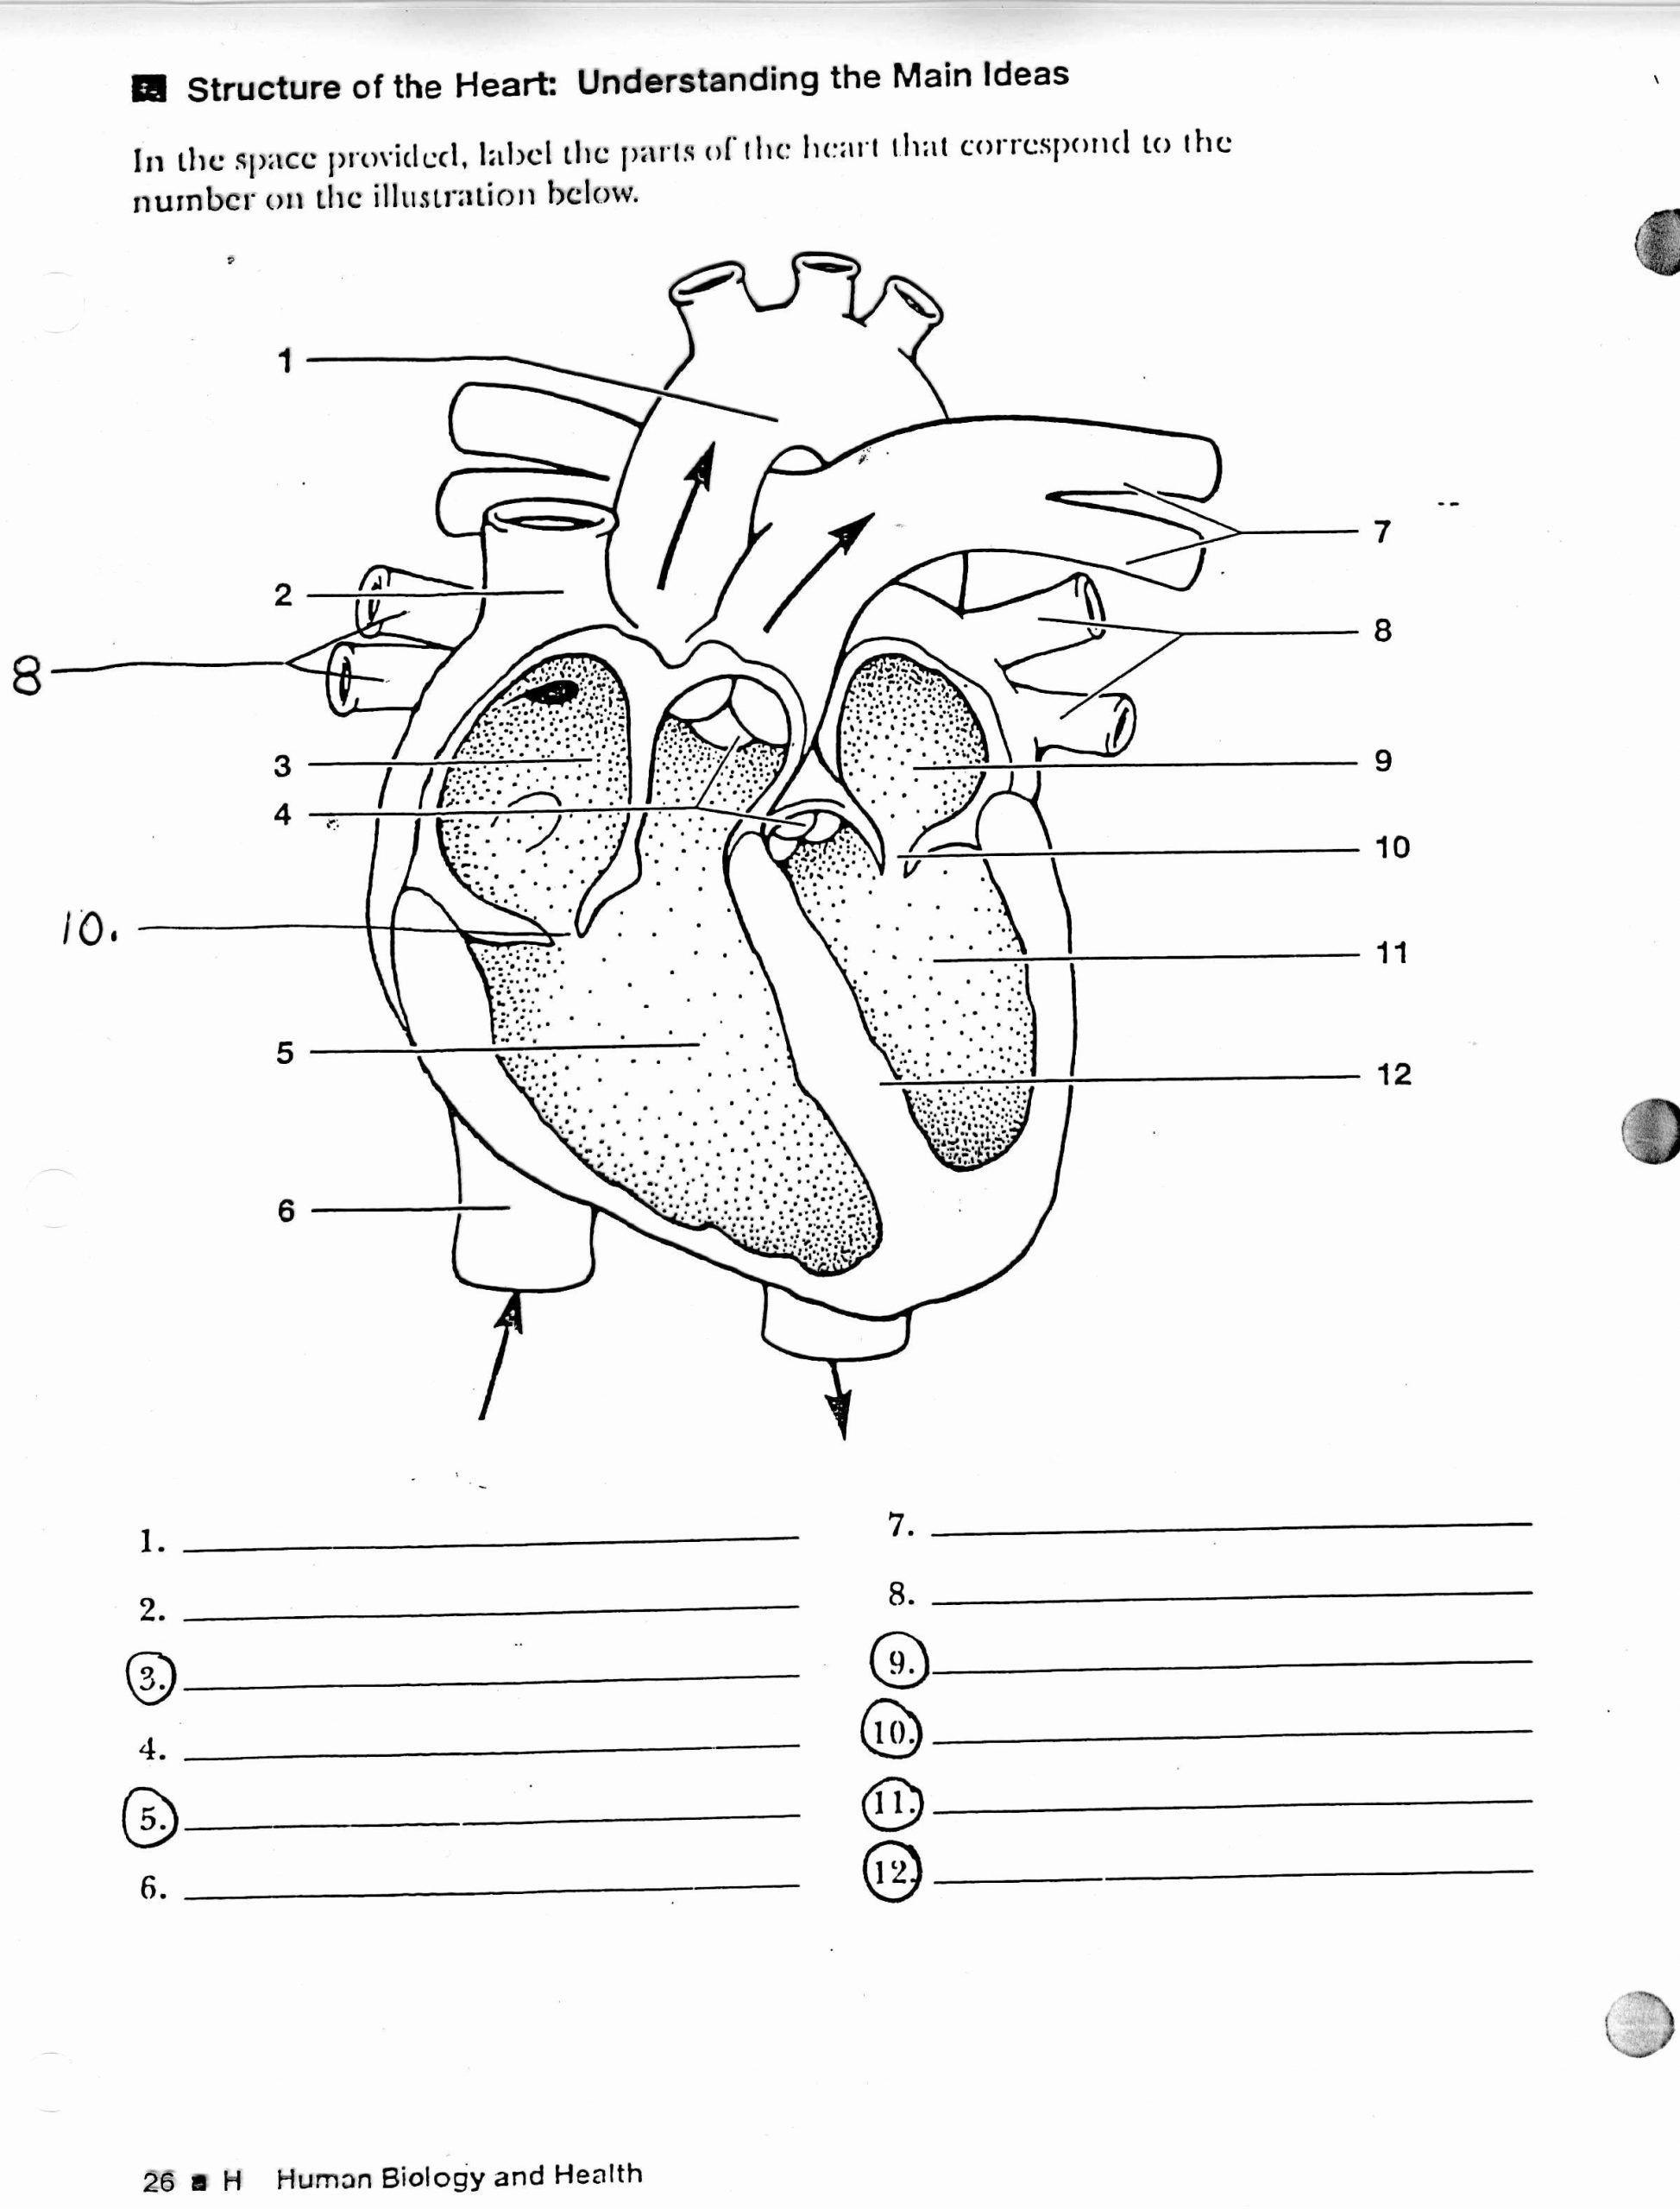 Printable Anatomy Labeling Worksheets Human Heart Coloring | Printable Anatomy Labeling Worksheets